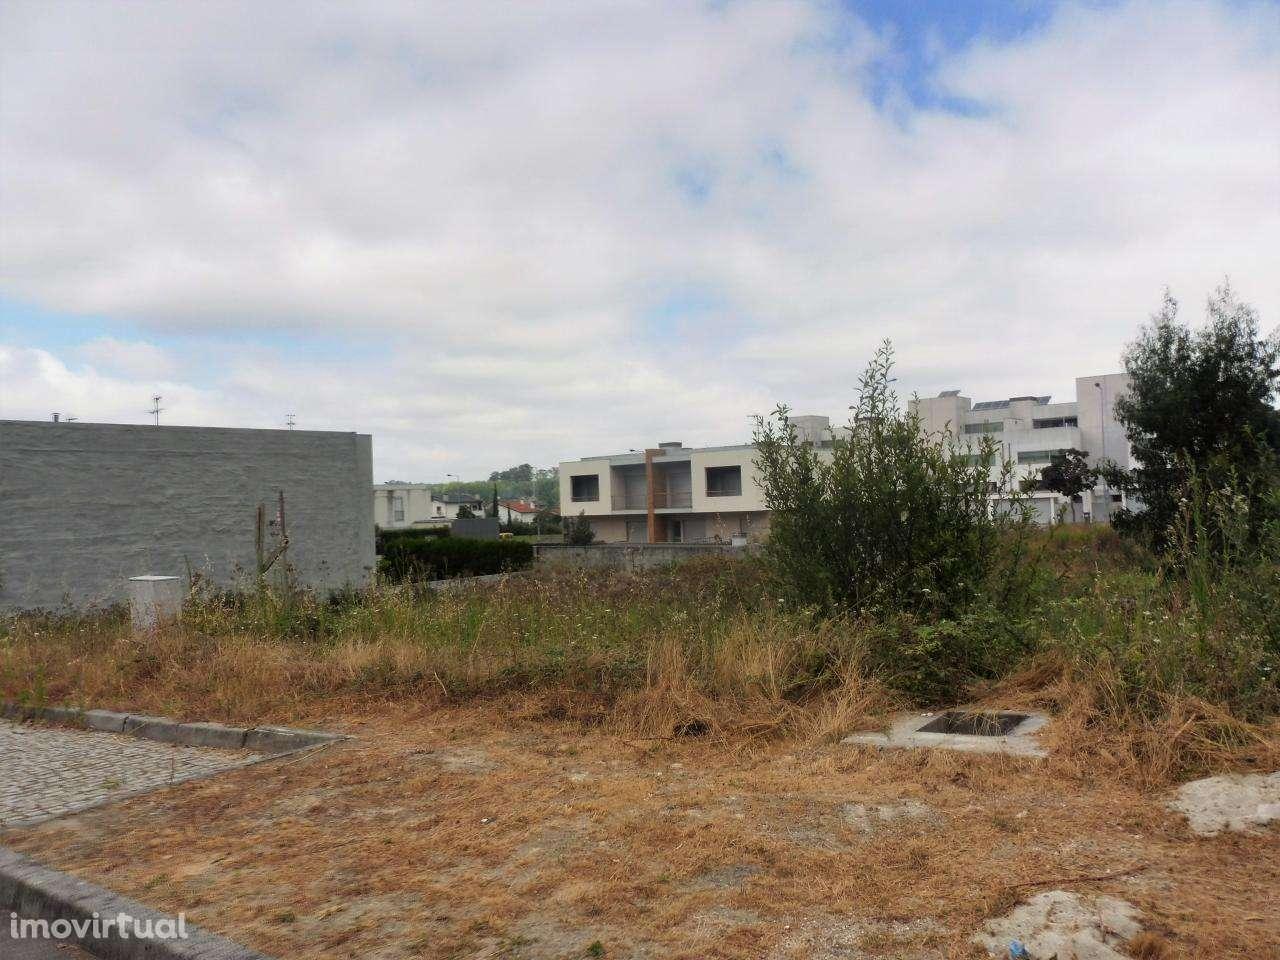 Terreno para comprar, Castêlo da Maia, Maia, Porto - Foto 2